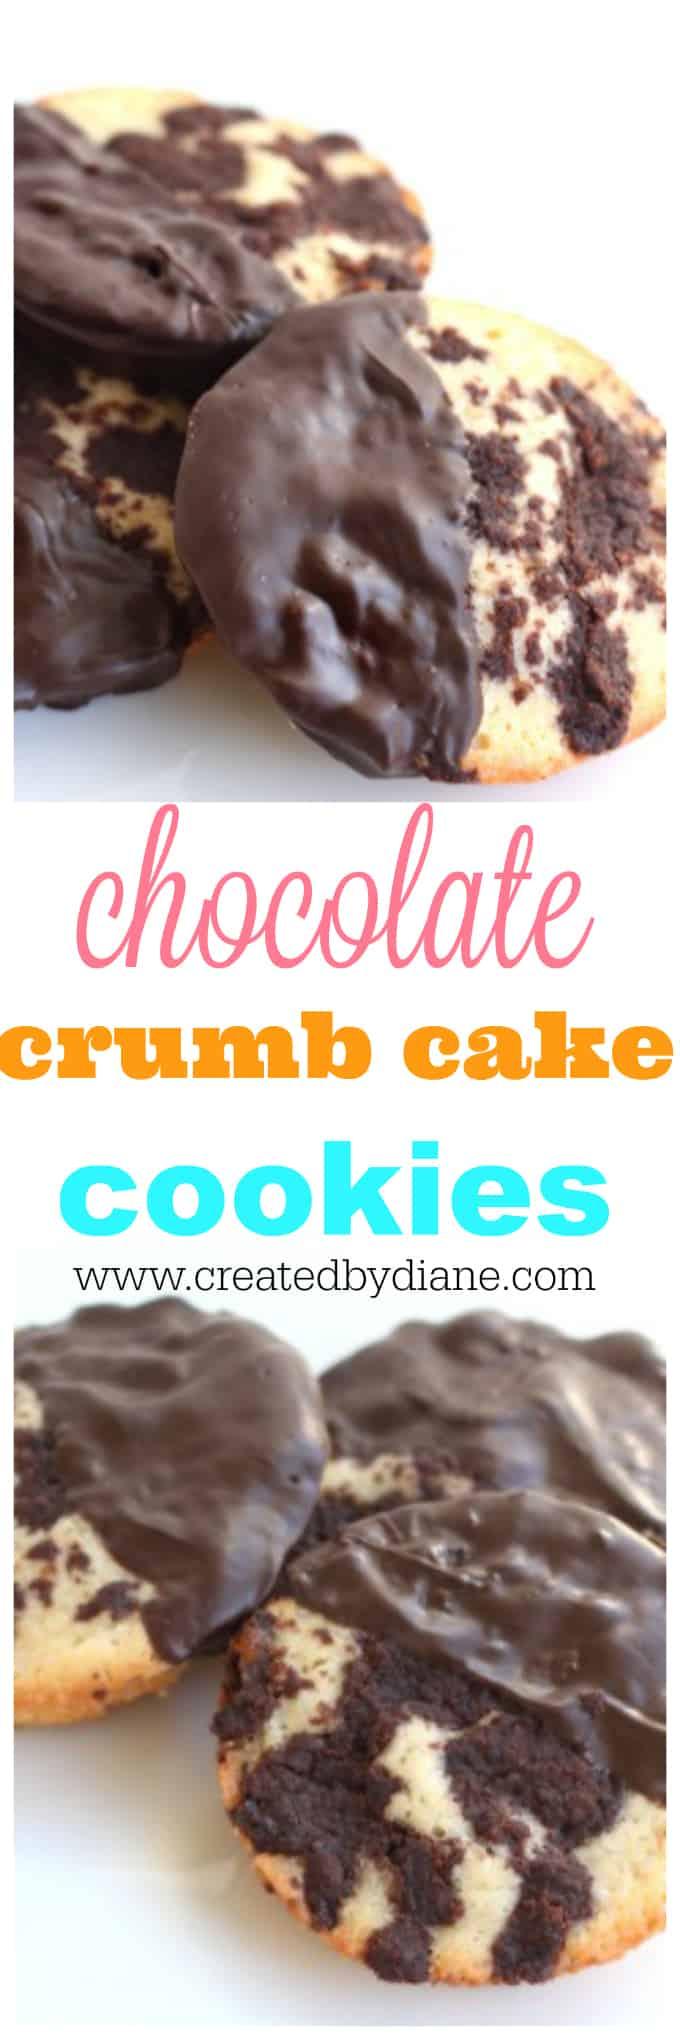 chocolate crumb cake cookies www.createdbydiane.com